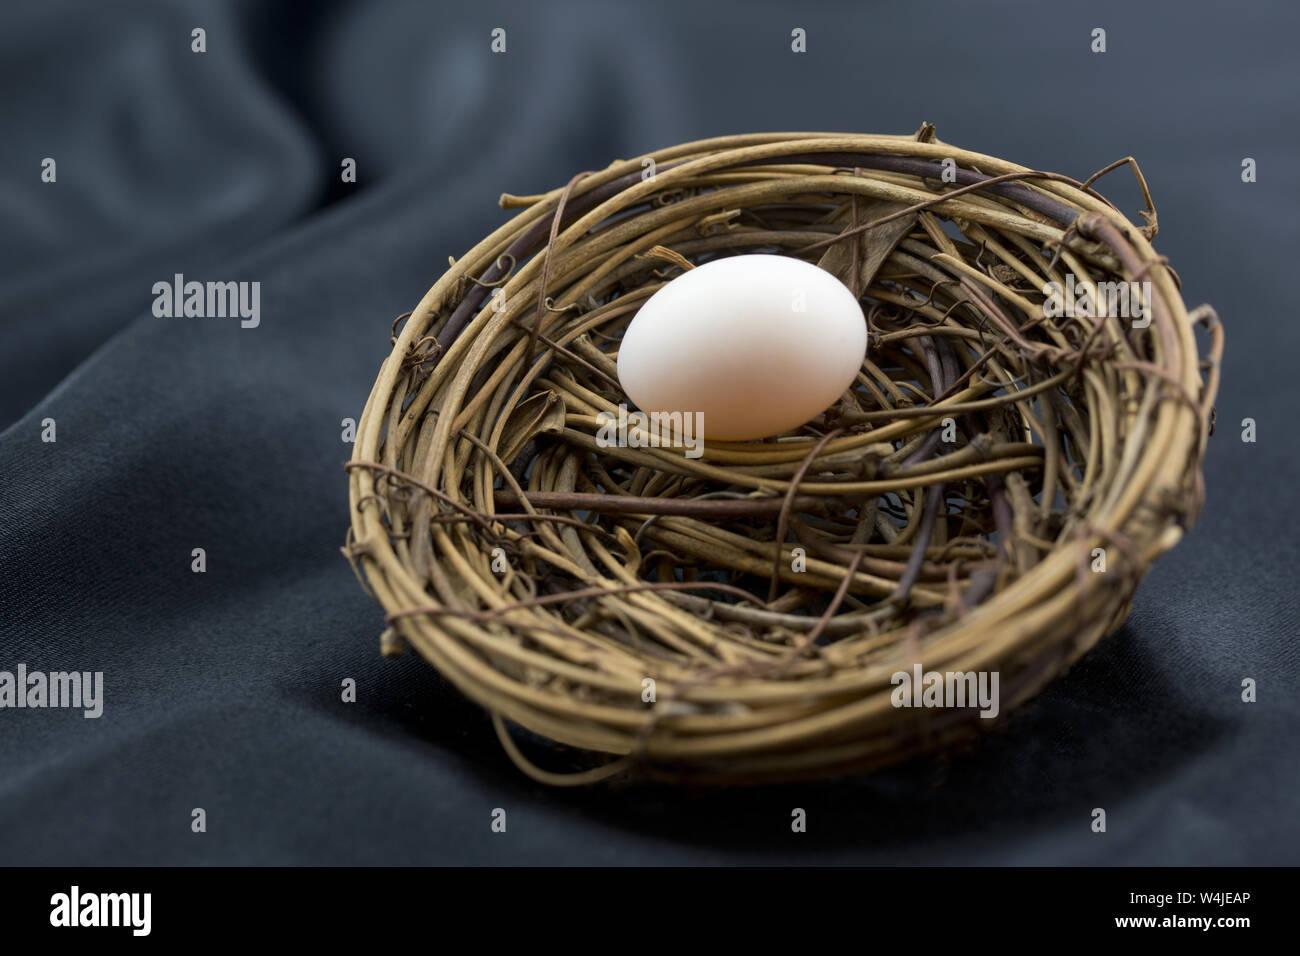 Elegant sophistication of black background enhances small nest egg as wise symbol of ordinary investment beginnings. Stock Photo